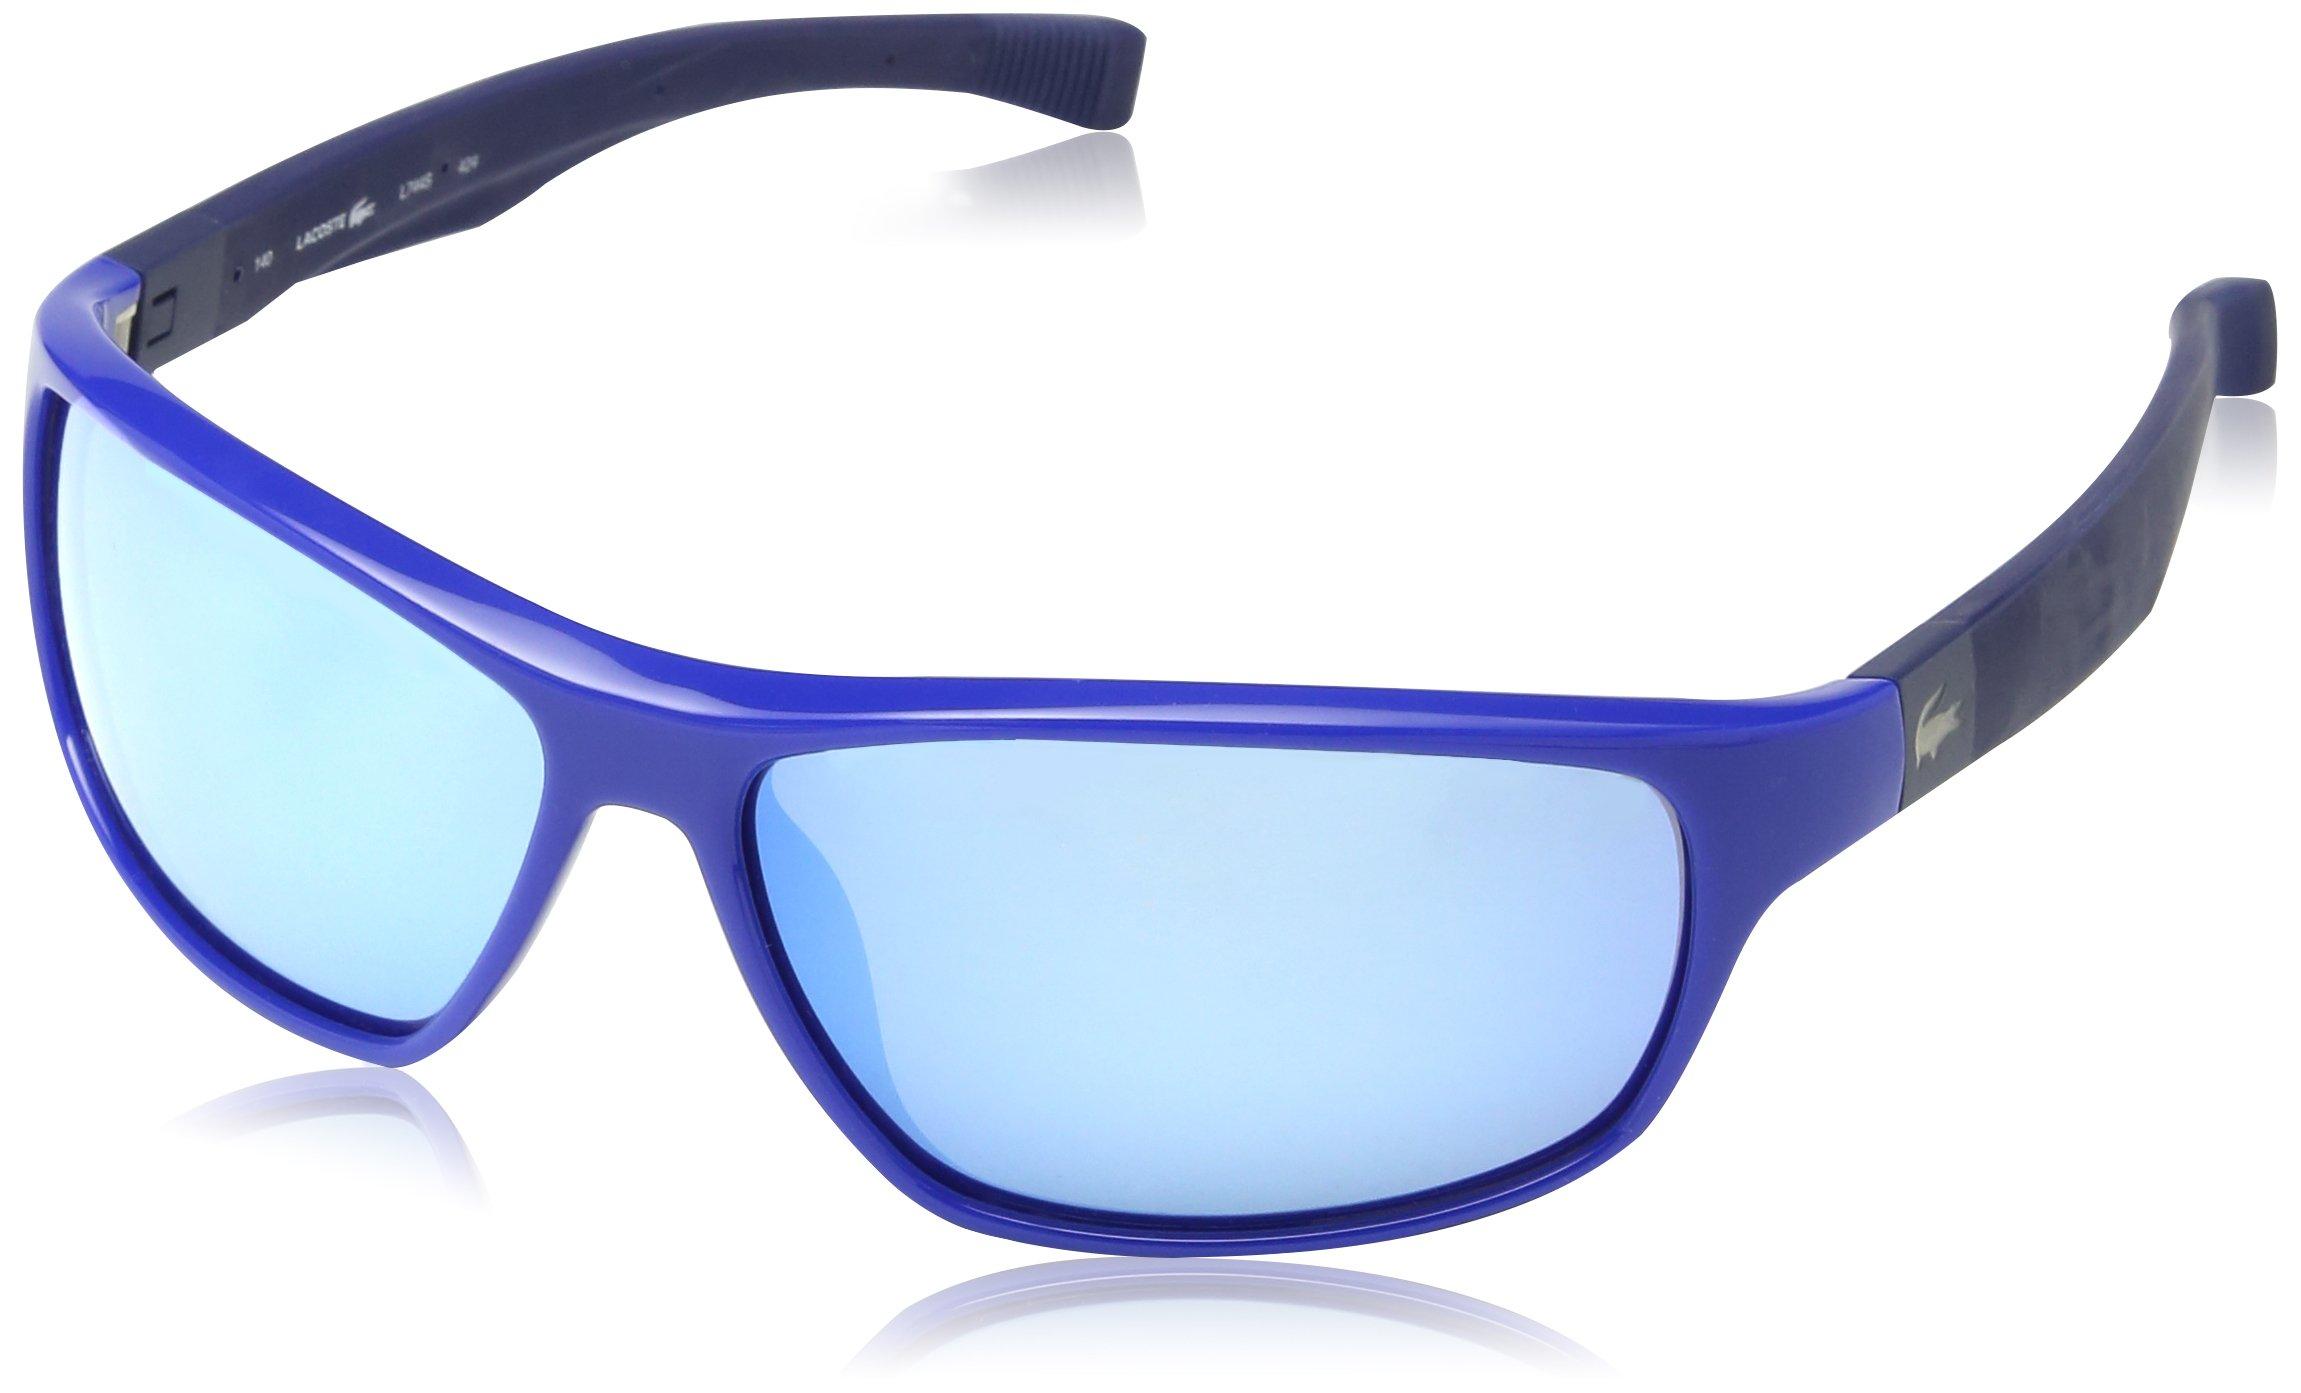 Lacoste Sunglasses - L744S (Blue)